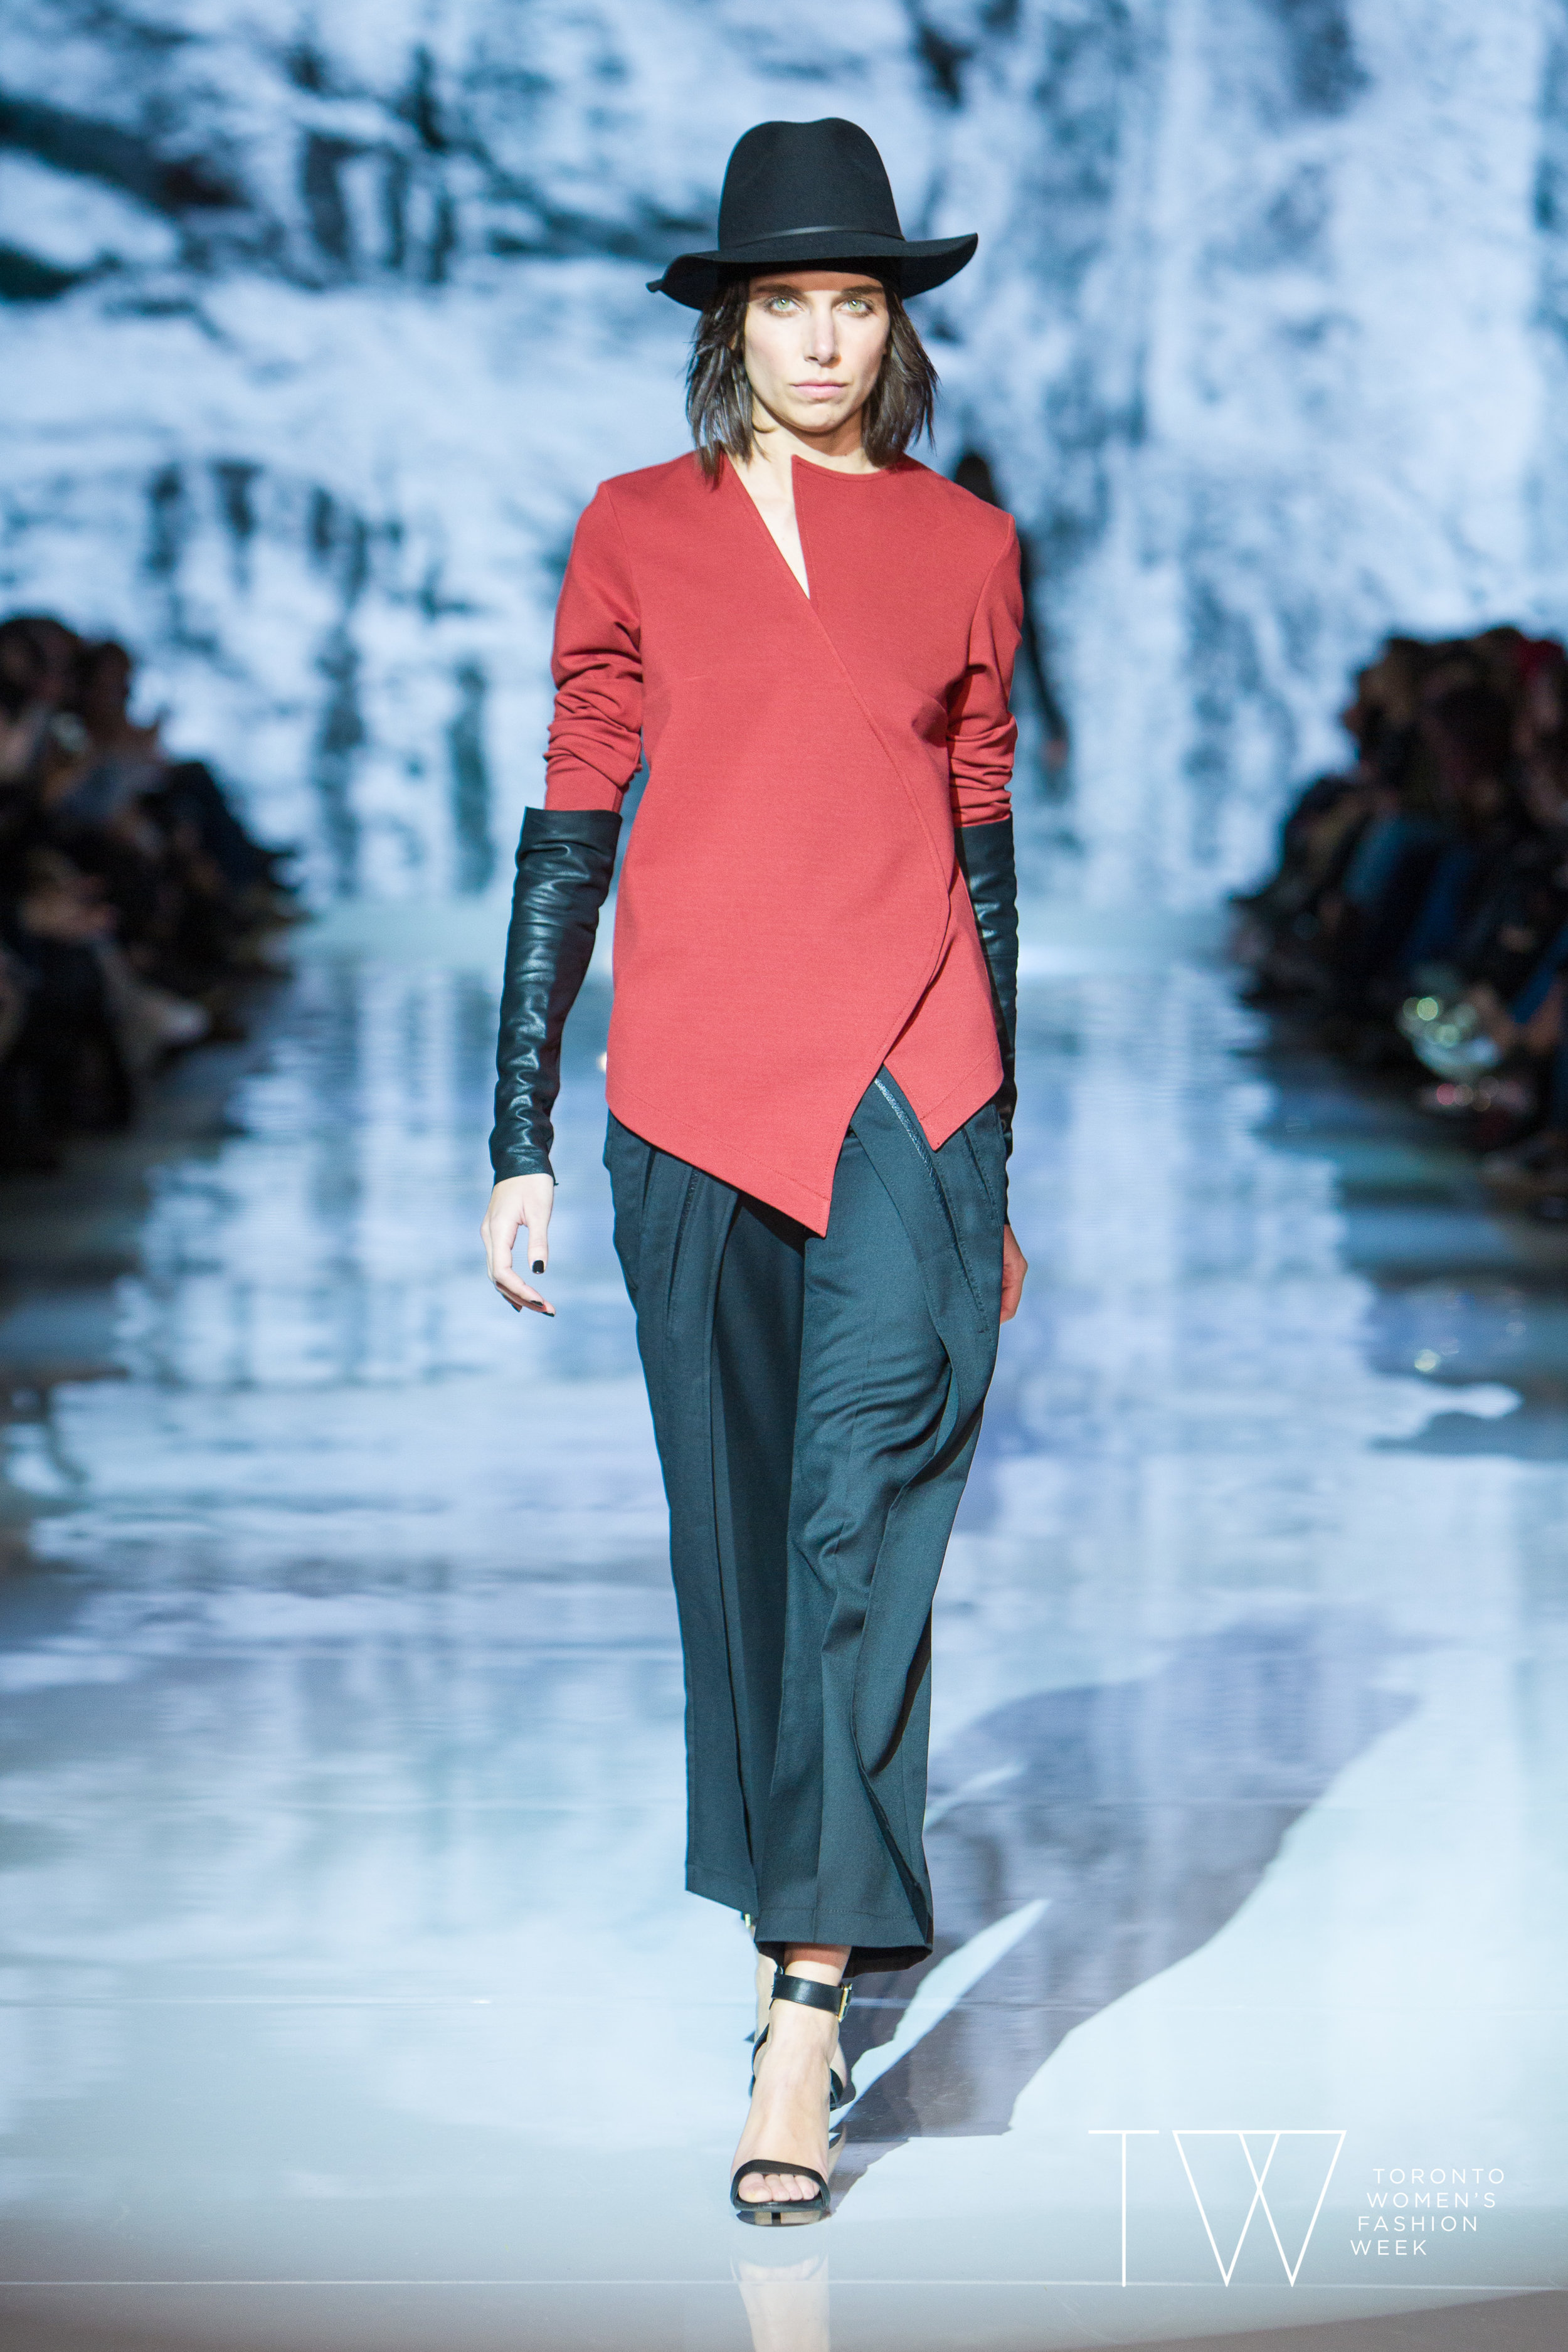 KQK image courtesy of Toronto Women's Fashion Week